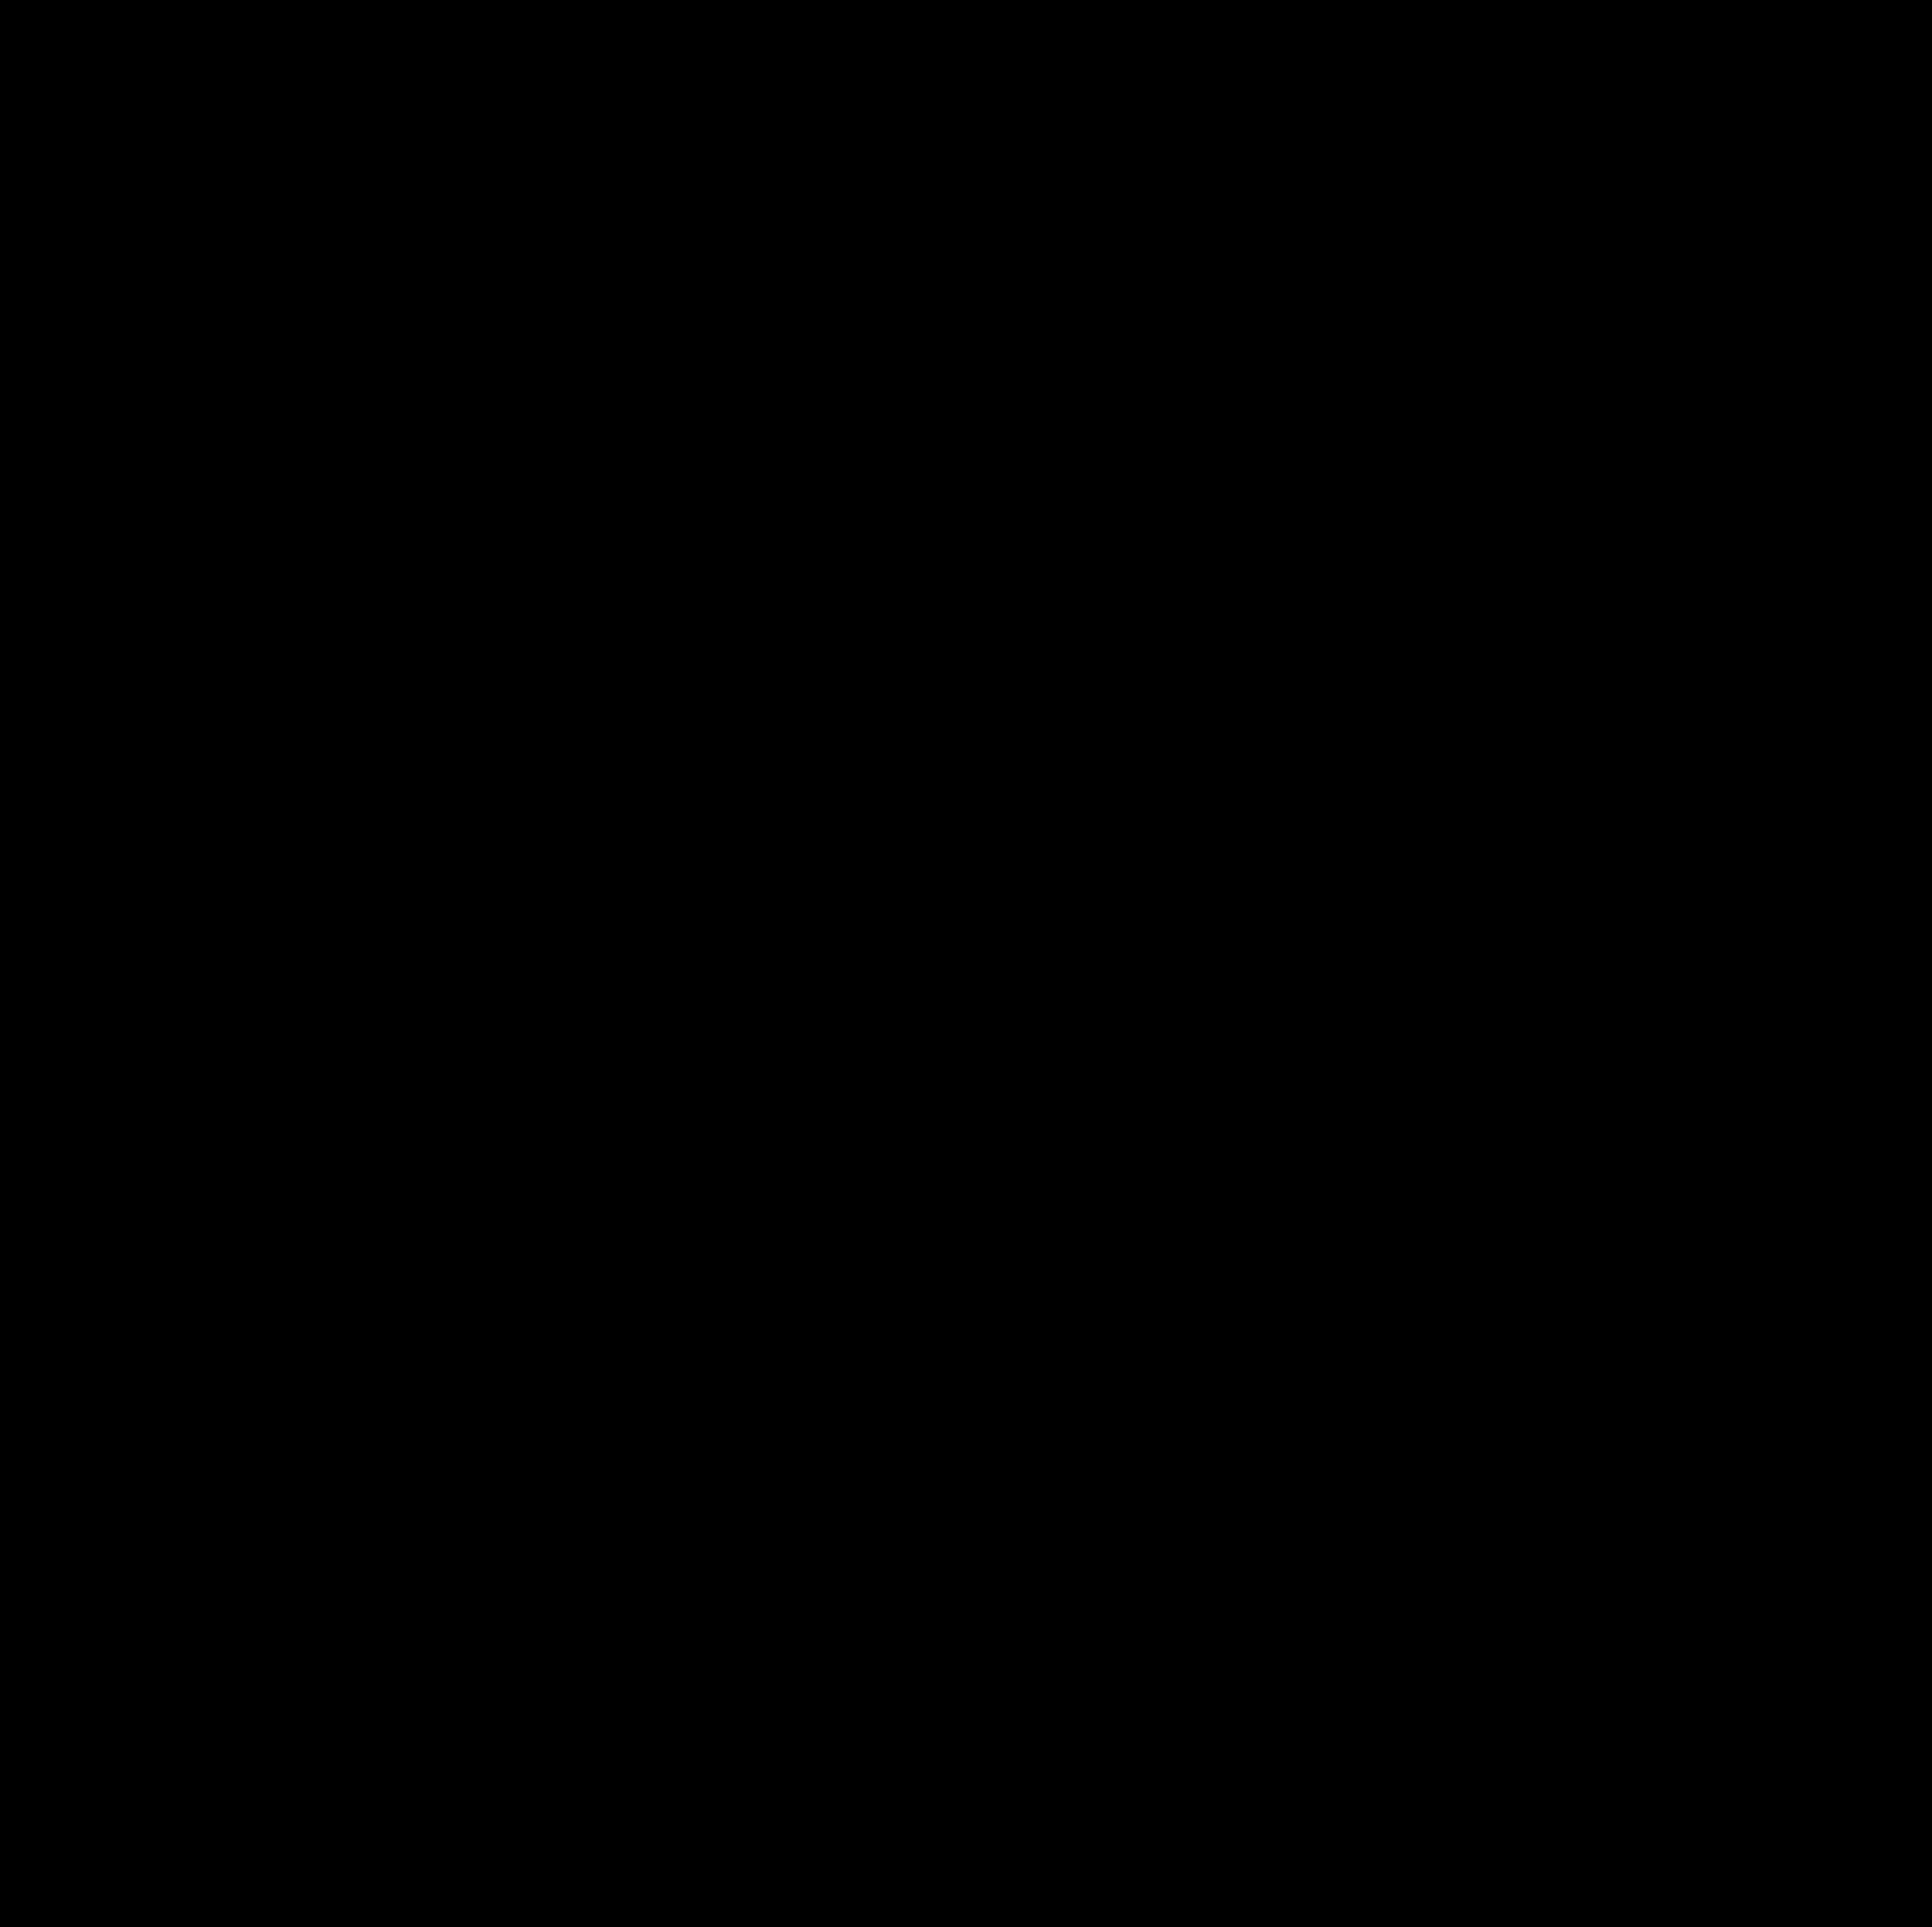 svg Virus clipart black and white. Malware hazard symbol big